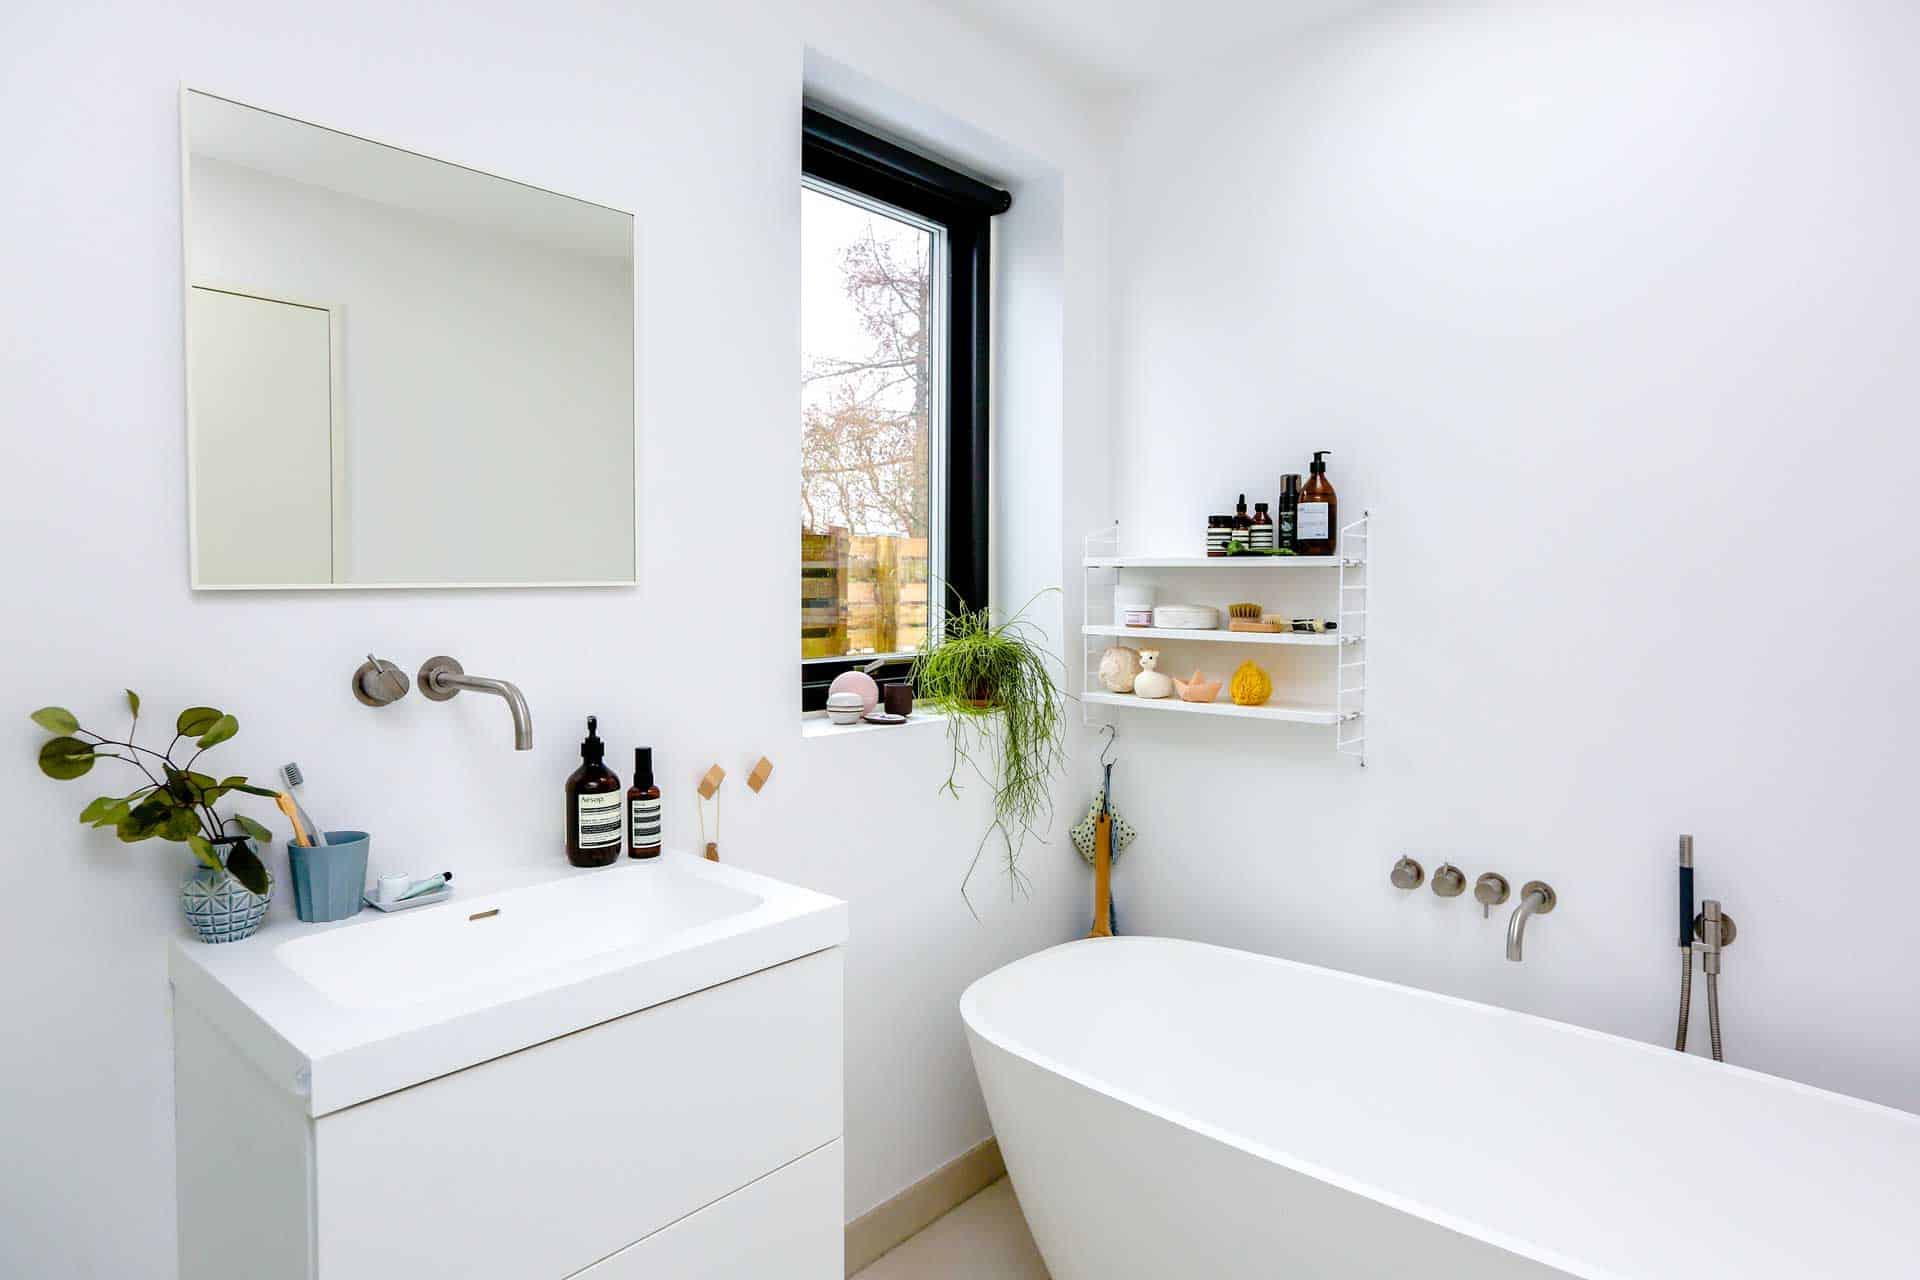 Home Design On A Budget: The Bathroom Makeover - Mark King ...